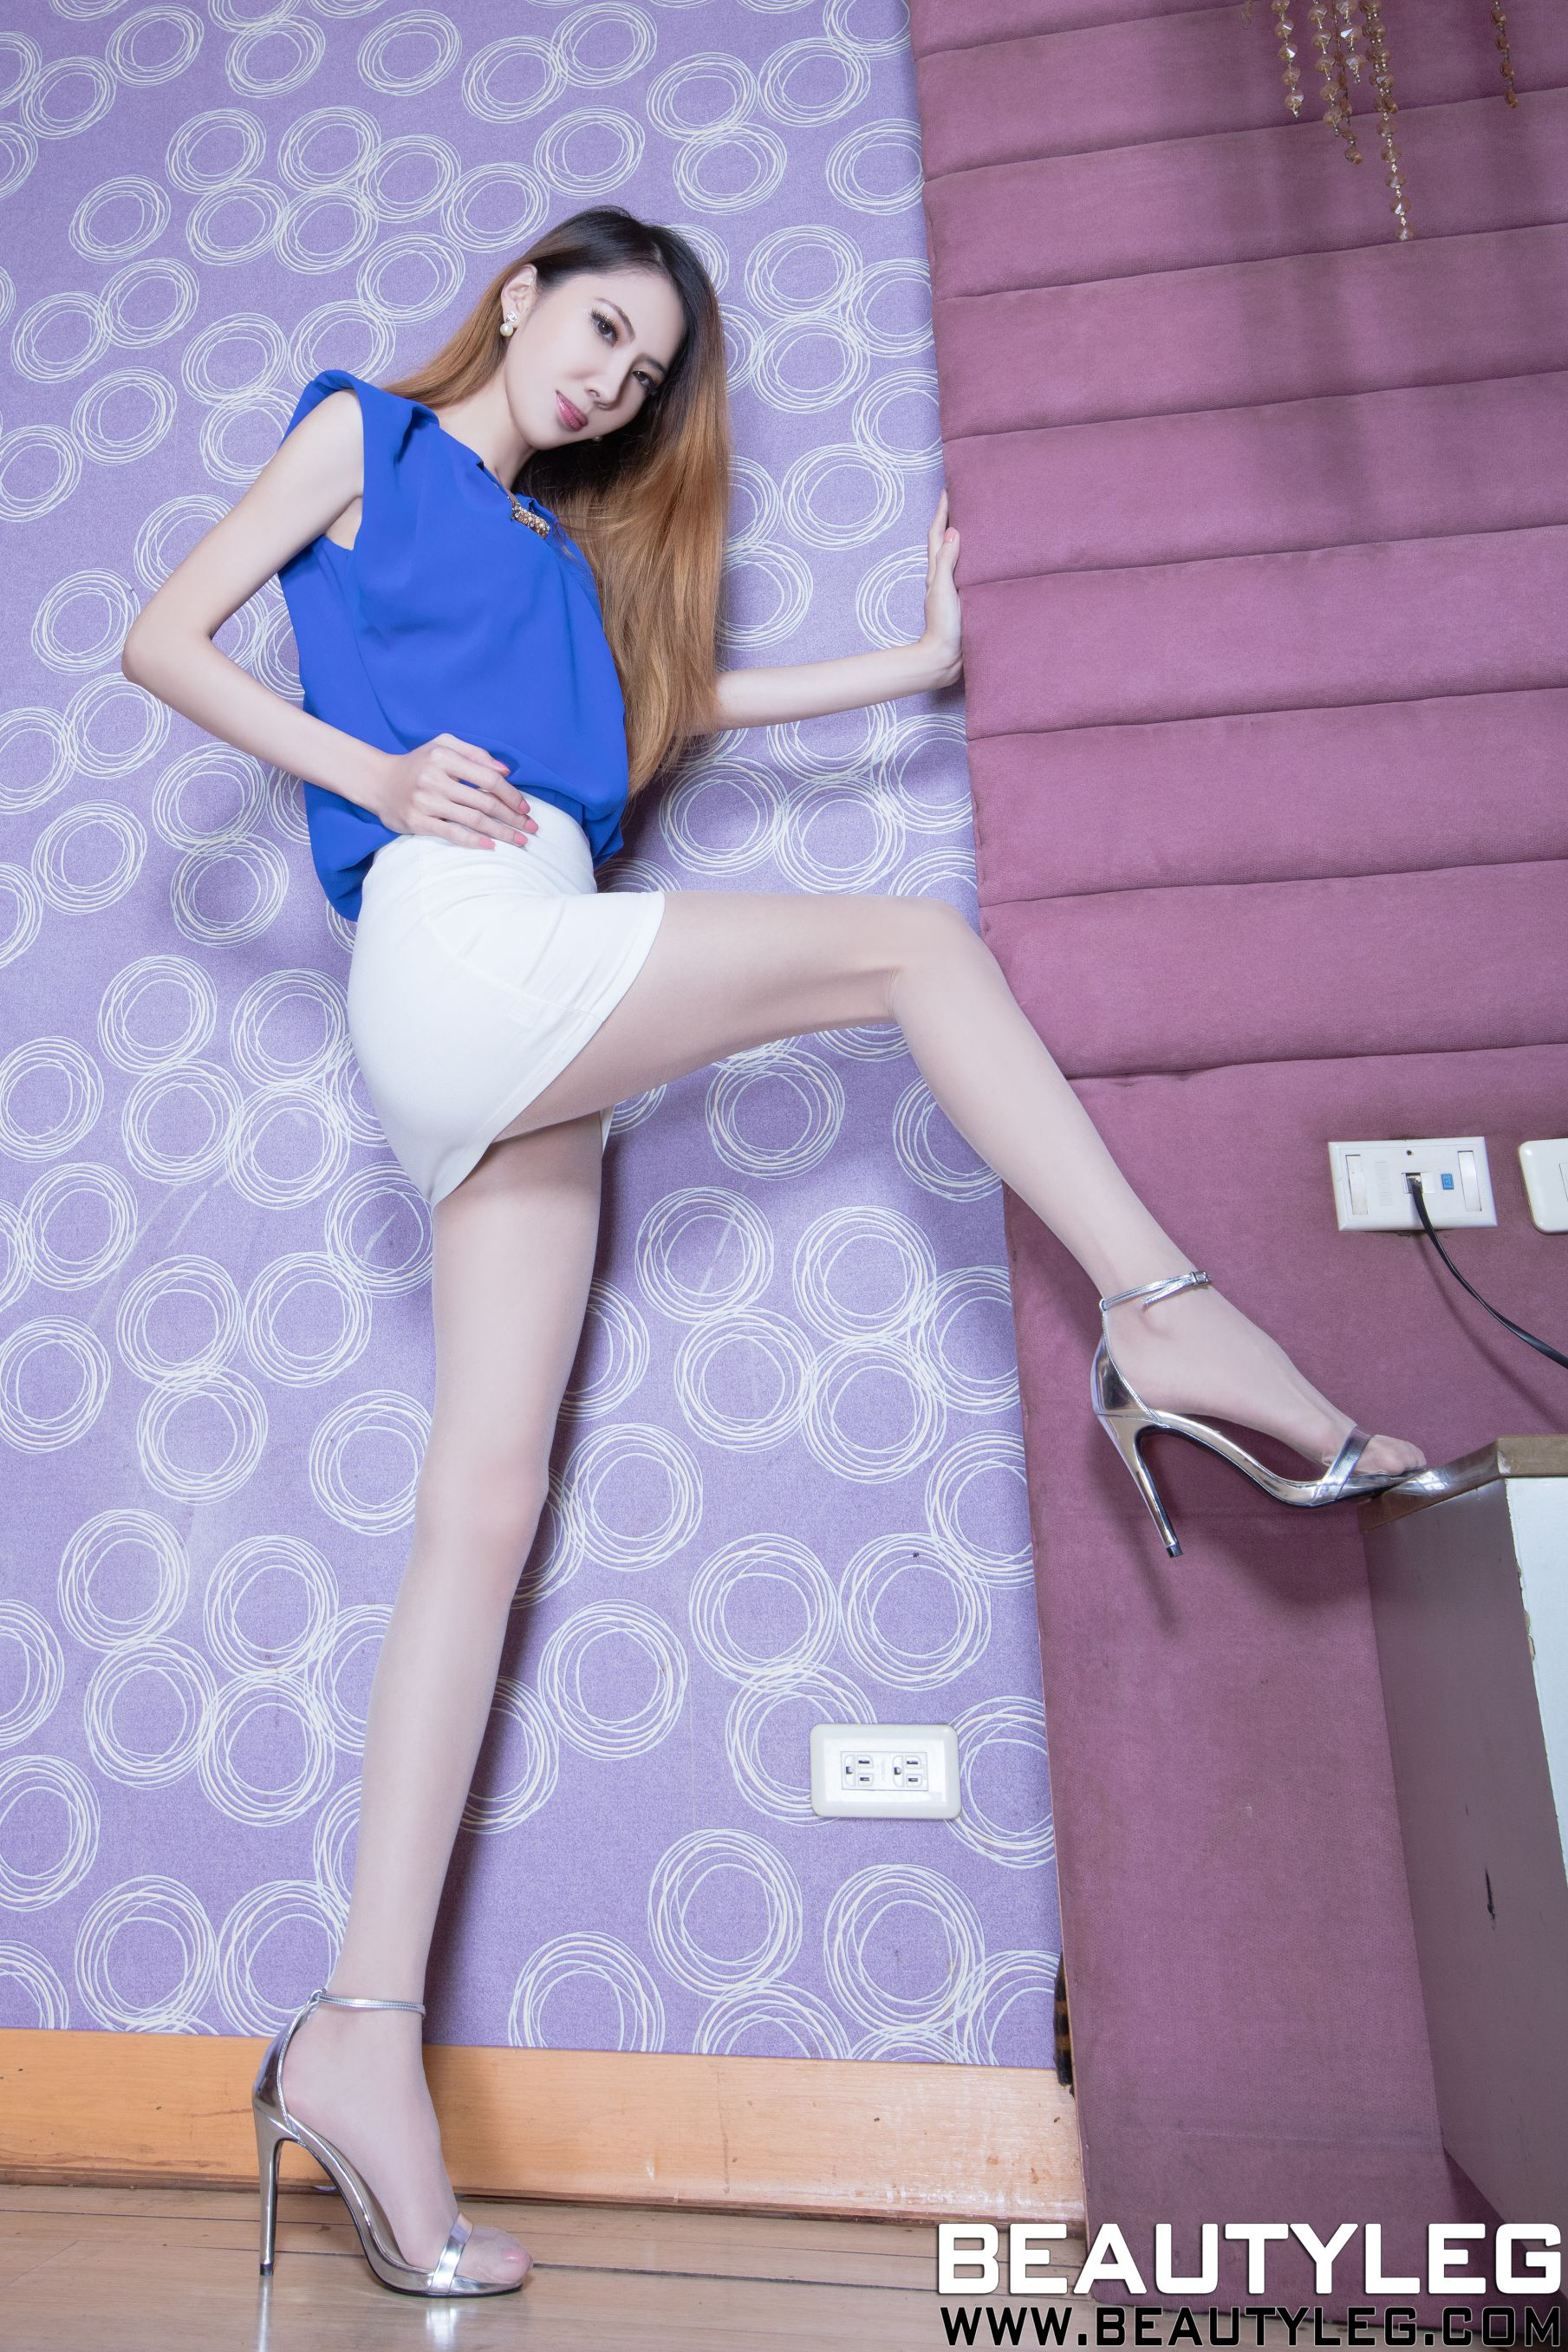 VOL.250 [Beautyleg]美腿情趣丝袜:童采萱(Beautyleg Yoyo,腿模Yoyo)高品质写真套图(42P)